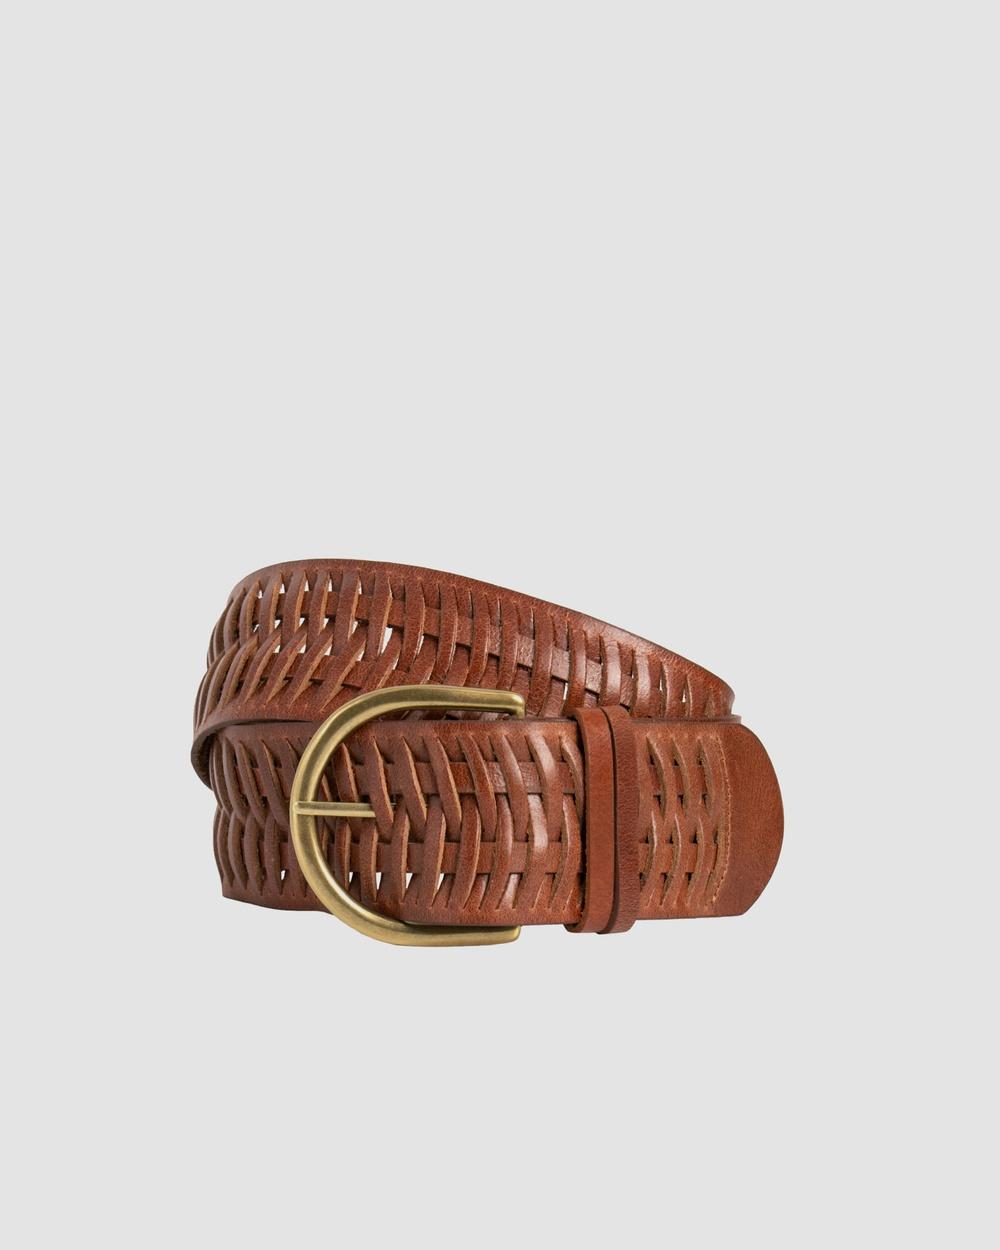 Loop Leather Co Matilda Belts Dark Tan